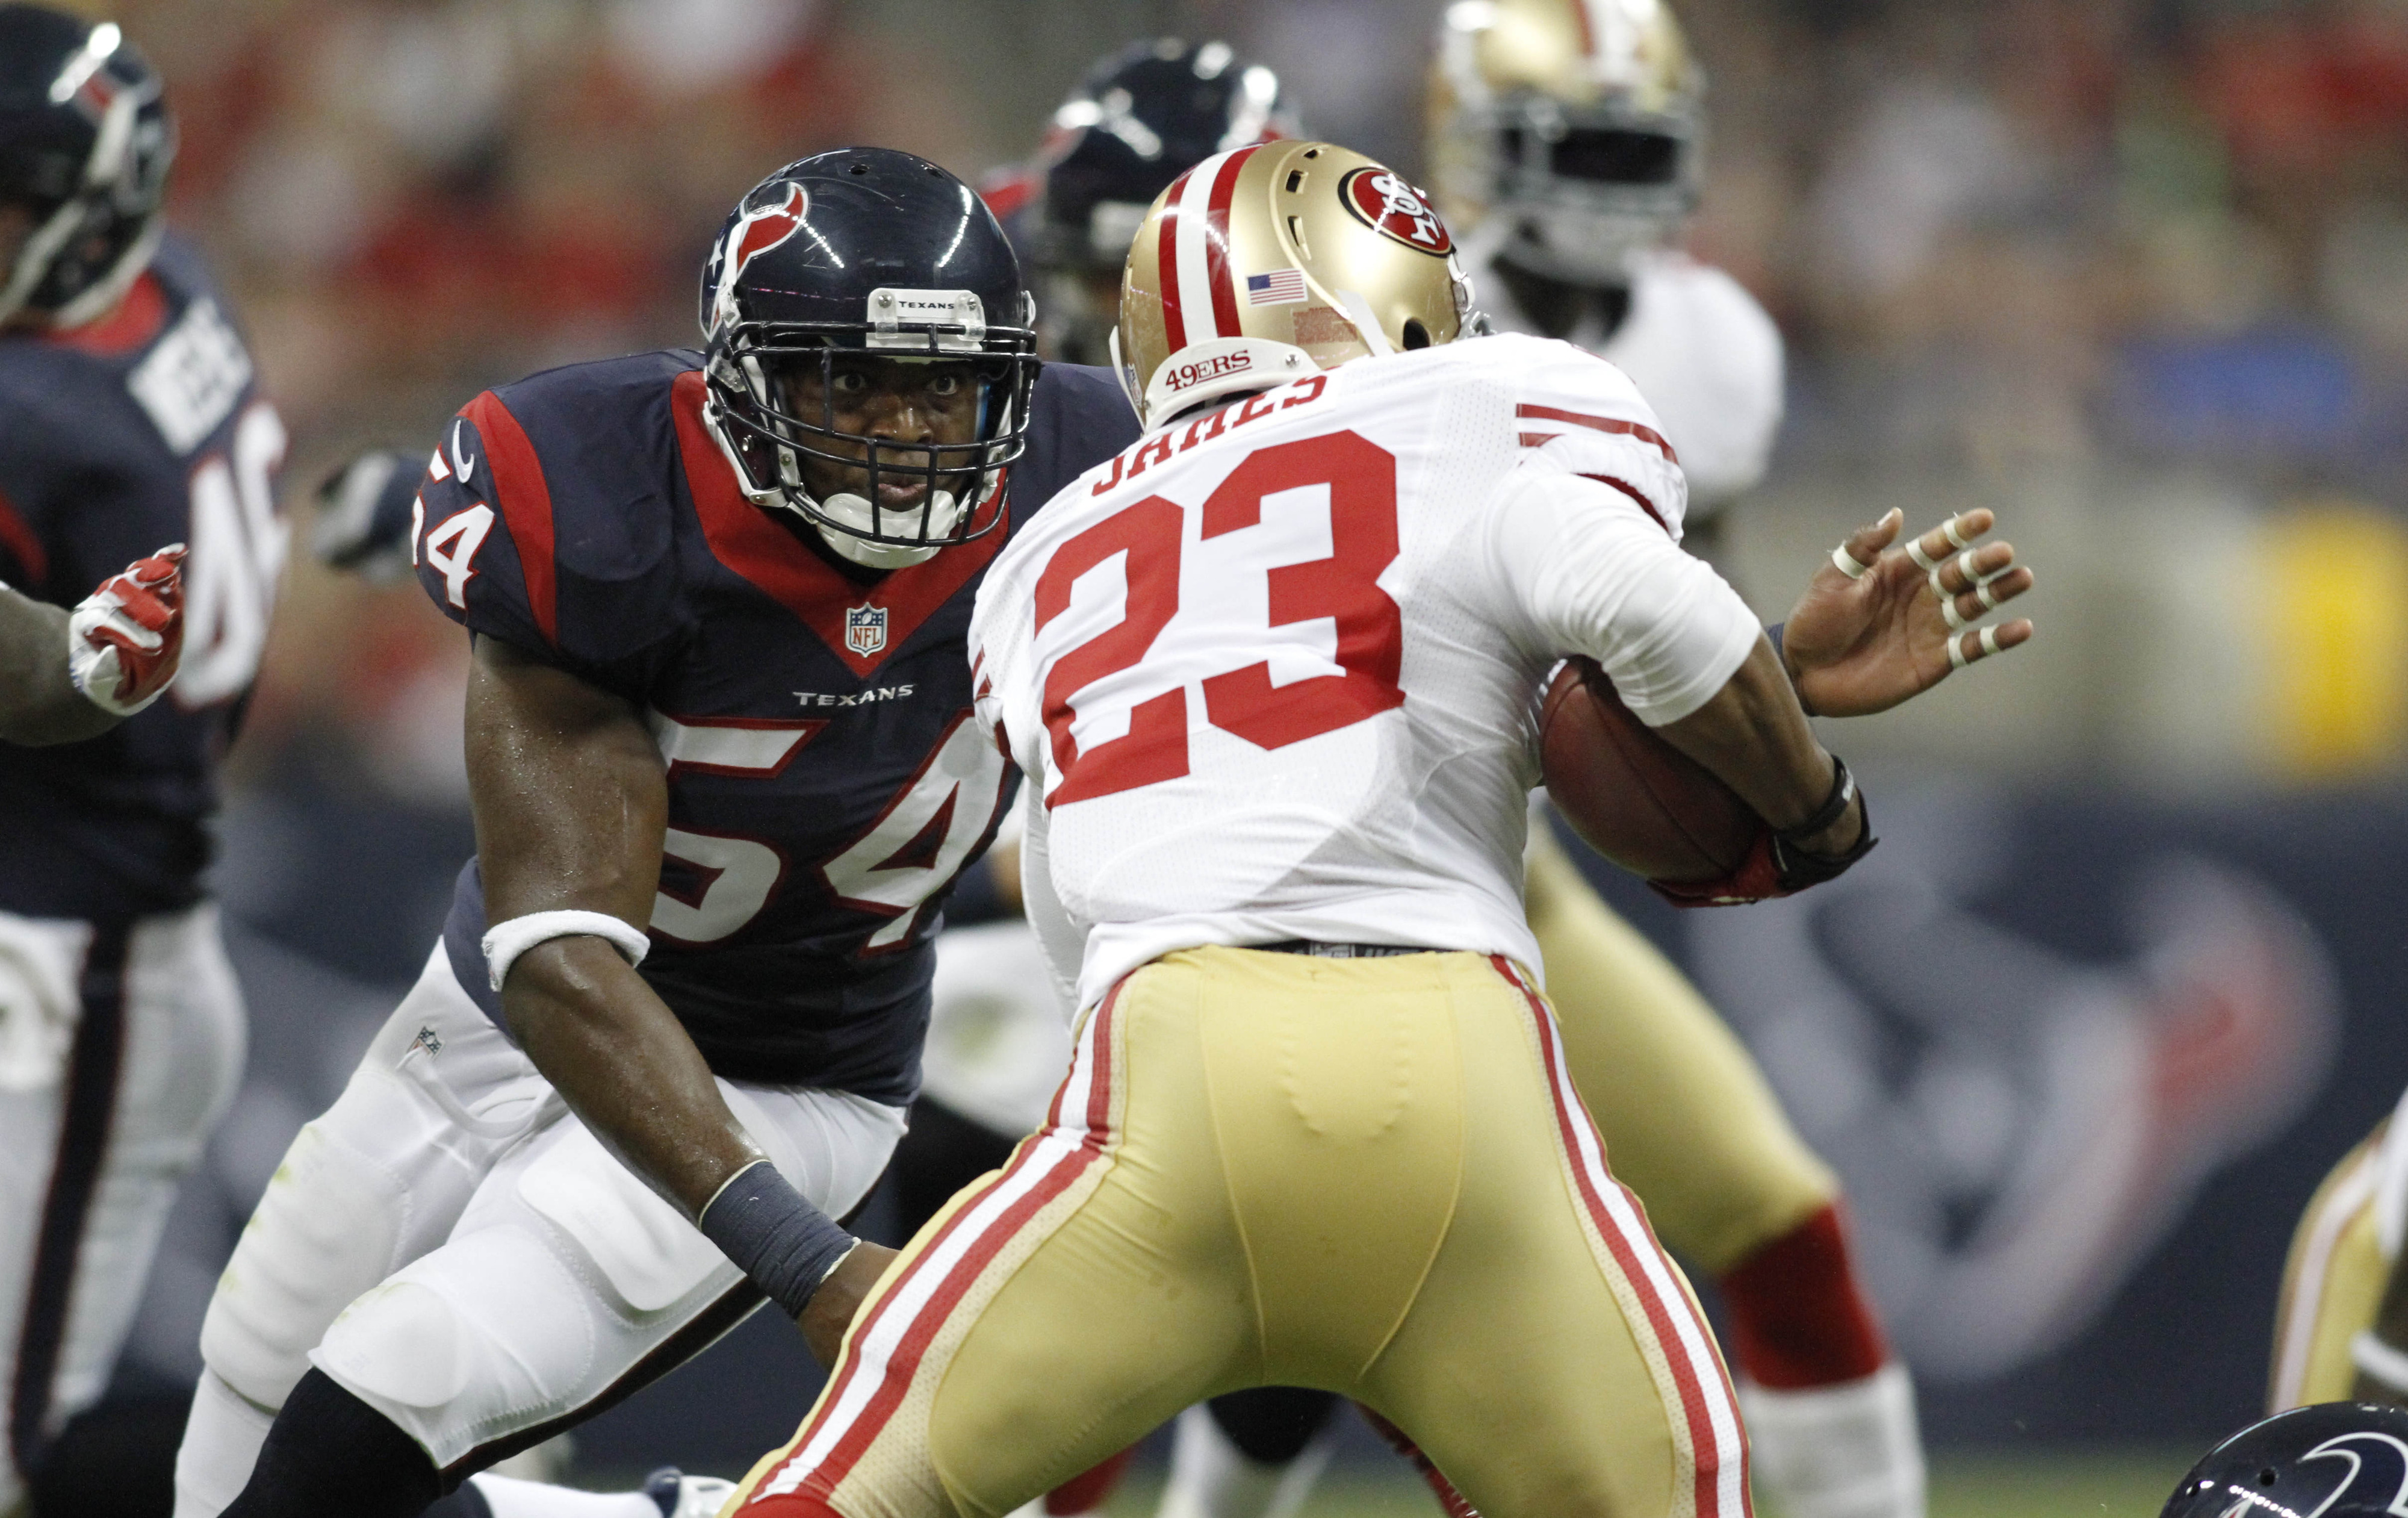 Aug 18, 2012; Houston, TX, USA; Houston Texans linebacker Mister Alexander (54) tackles San Francisco 49ers running back LaMichael James (23) in the first quarter at Reliant Stadium. Mandatory Credit: Brett Davis-US PRESSWIRE